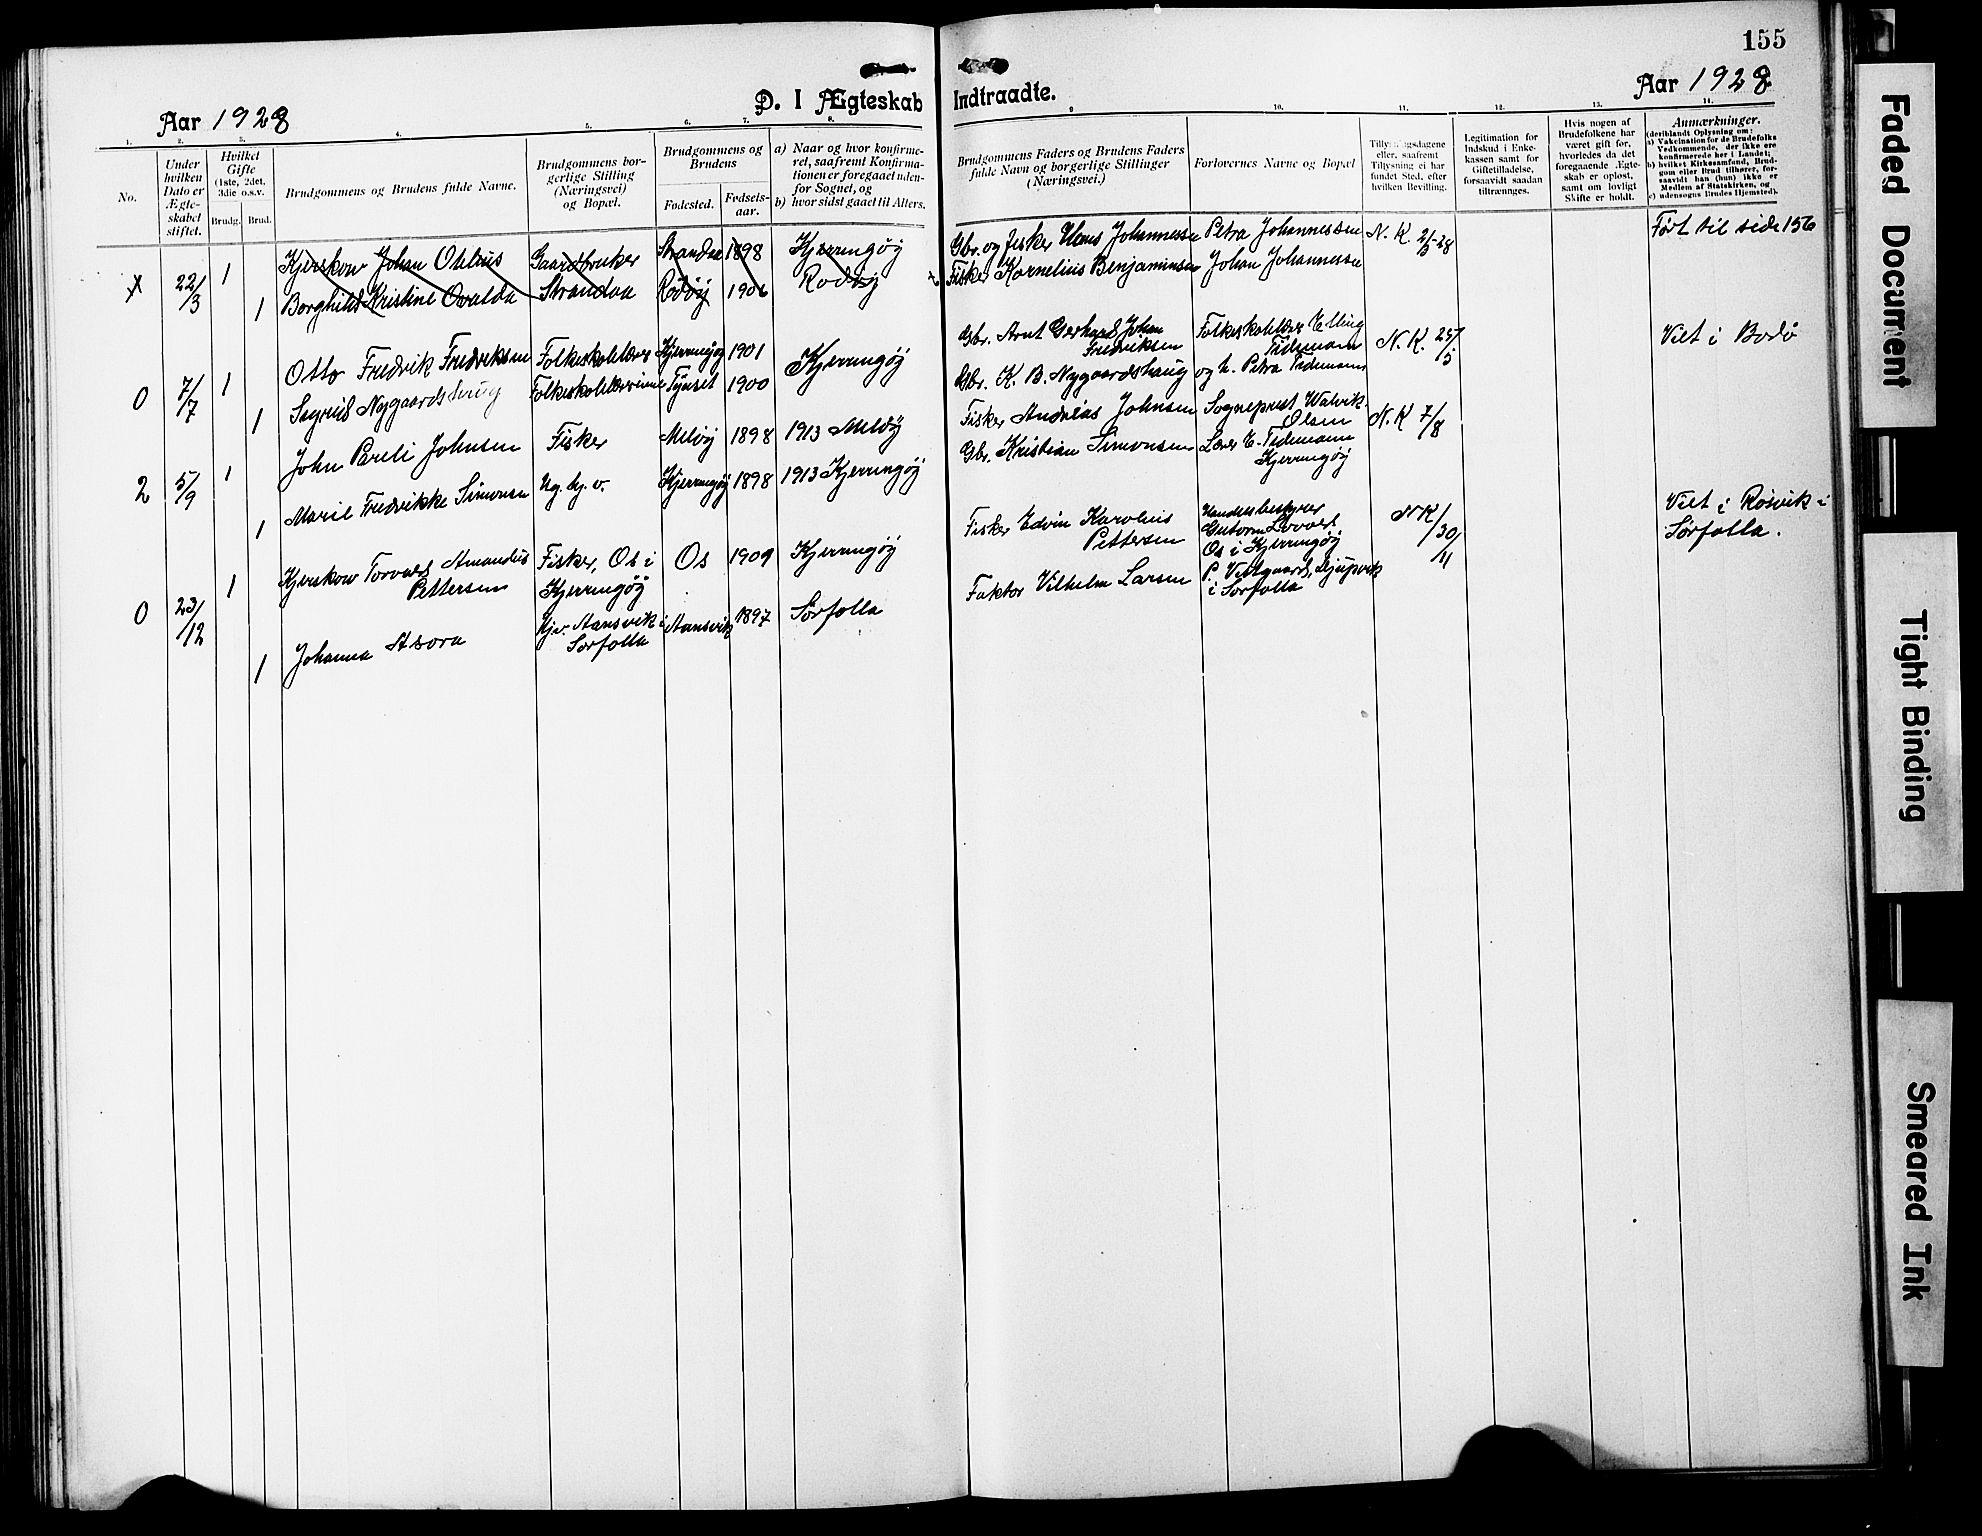 SAT, Ministerialprotokoller, klokkerbøker og fødselsregistre - Nordland, 803/L0077: Klokkerbok nr. 803C04, 1897-1930, s. 155